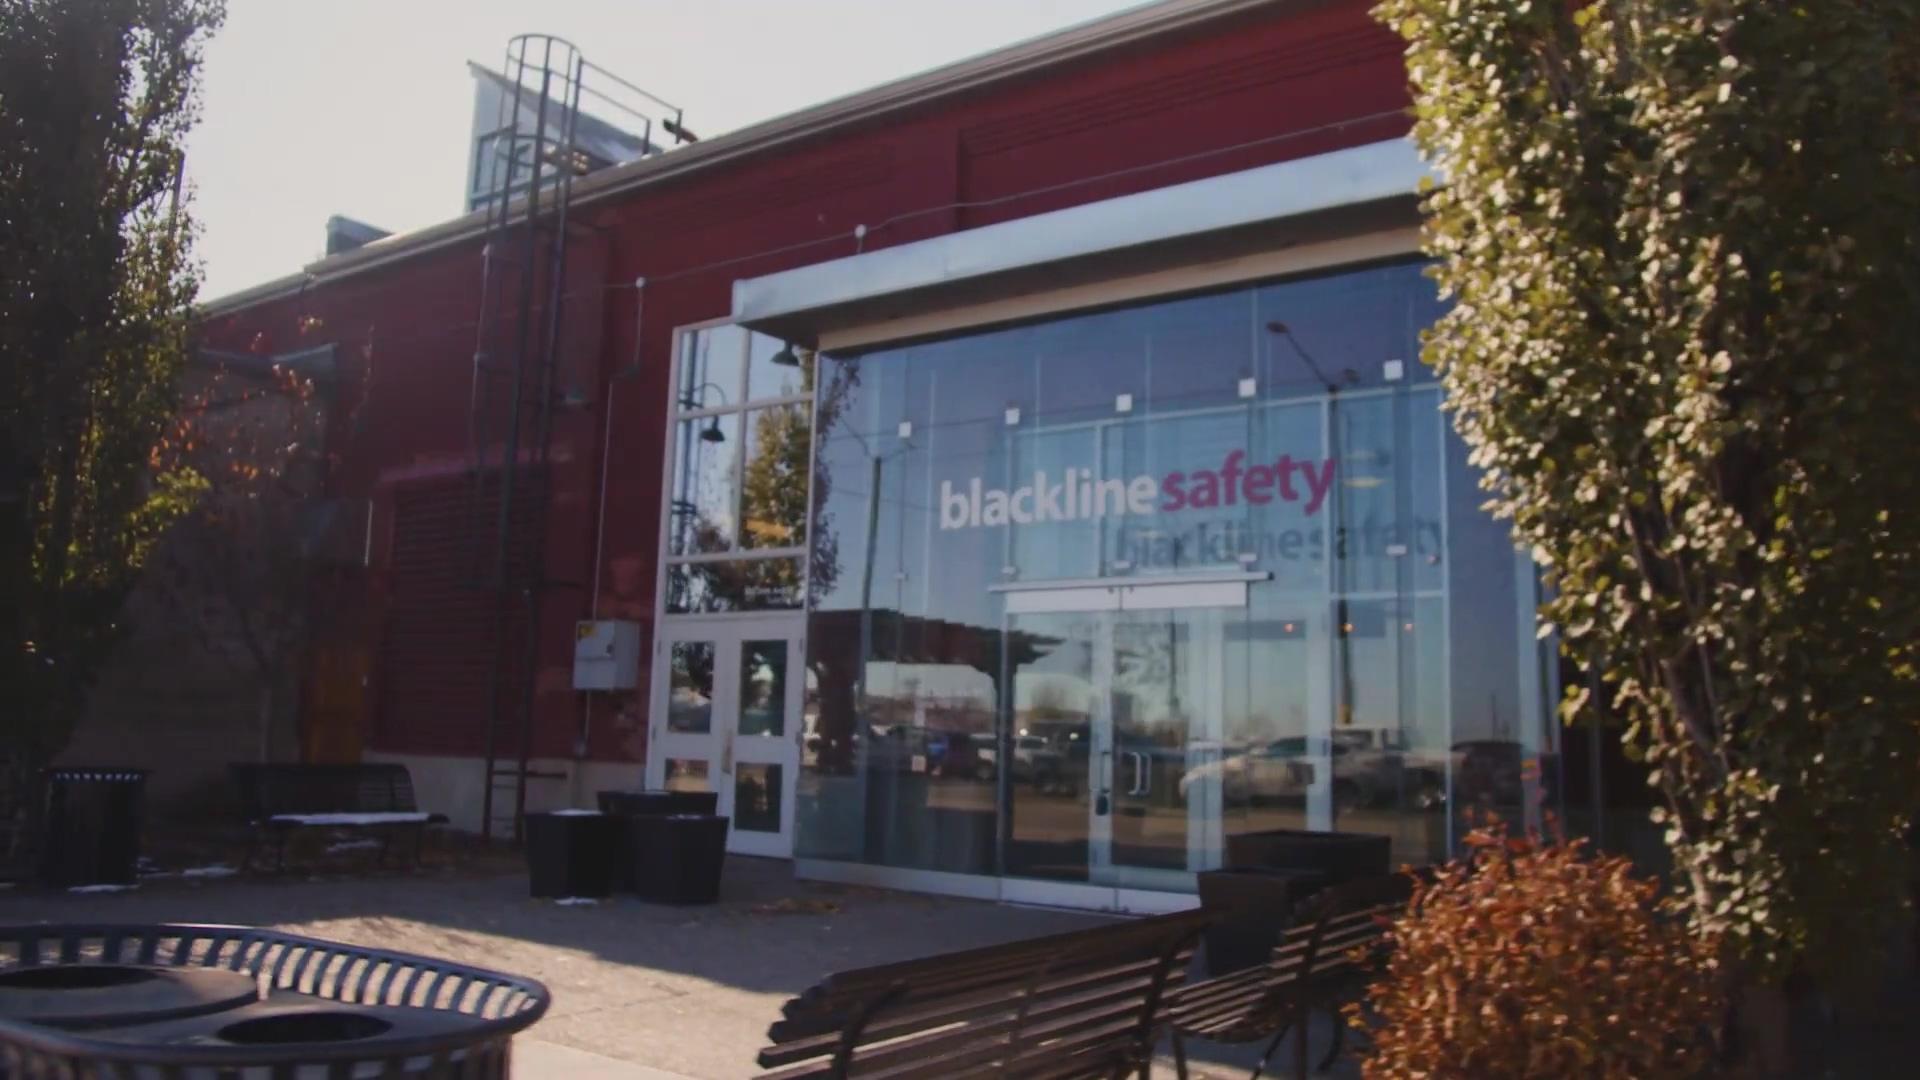 About Blackline Safety video at Dominion Bridge headquarters